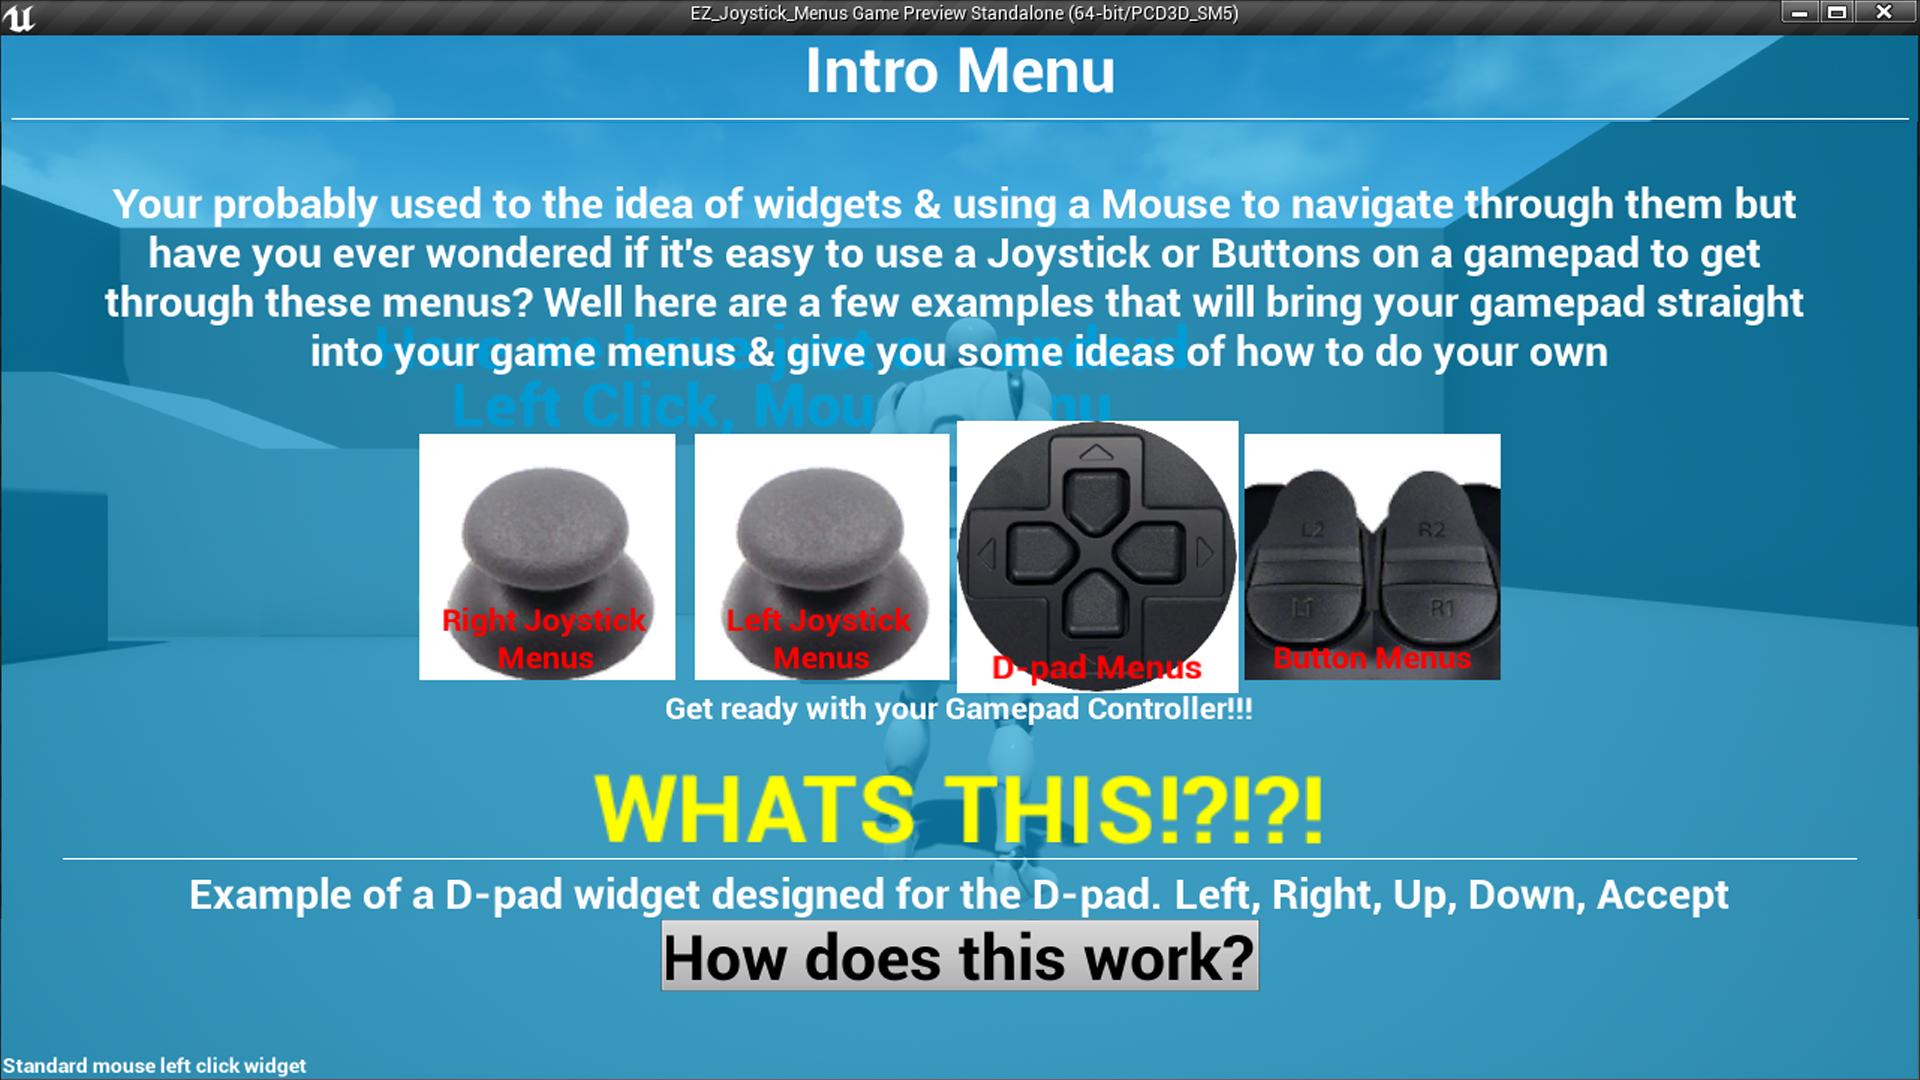 EZ_Joystick_Menus by BenReid in Blueprints - UE4 Marketplace